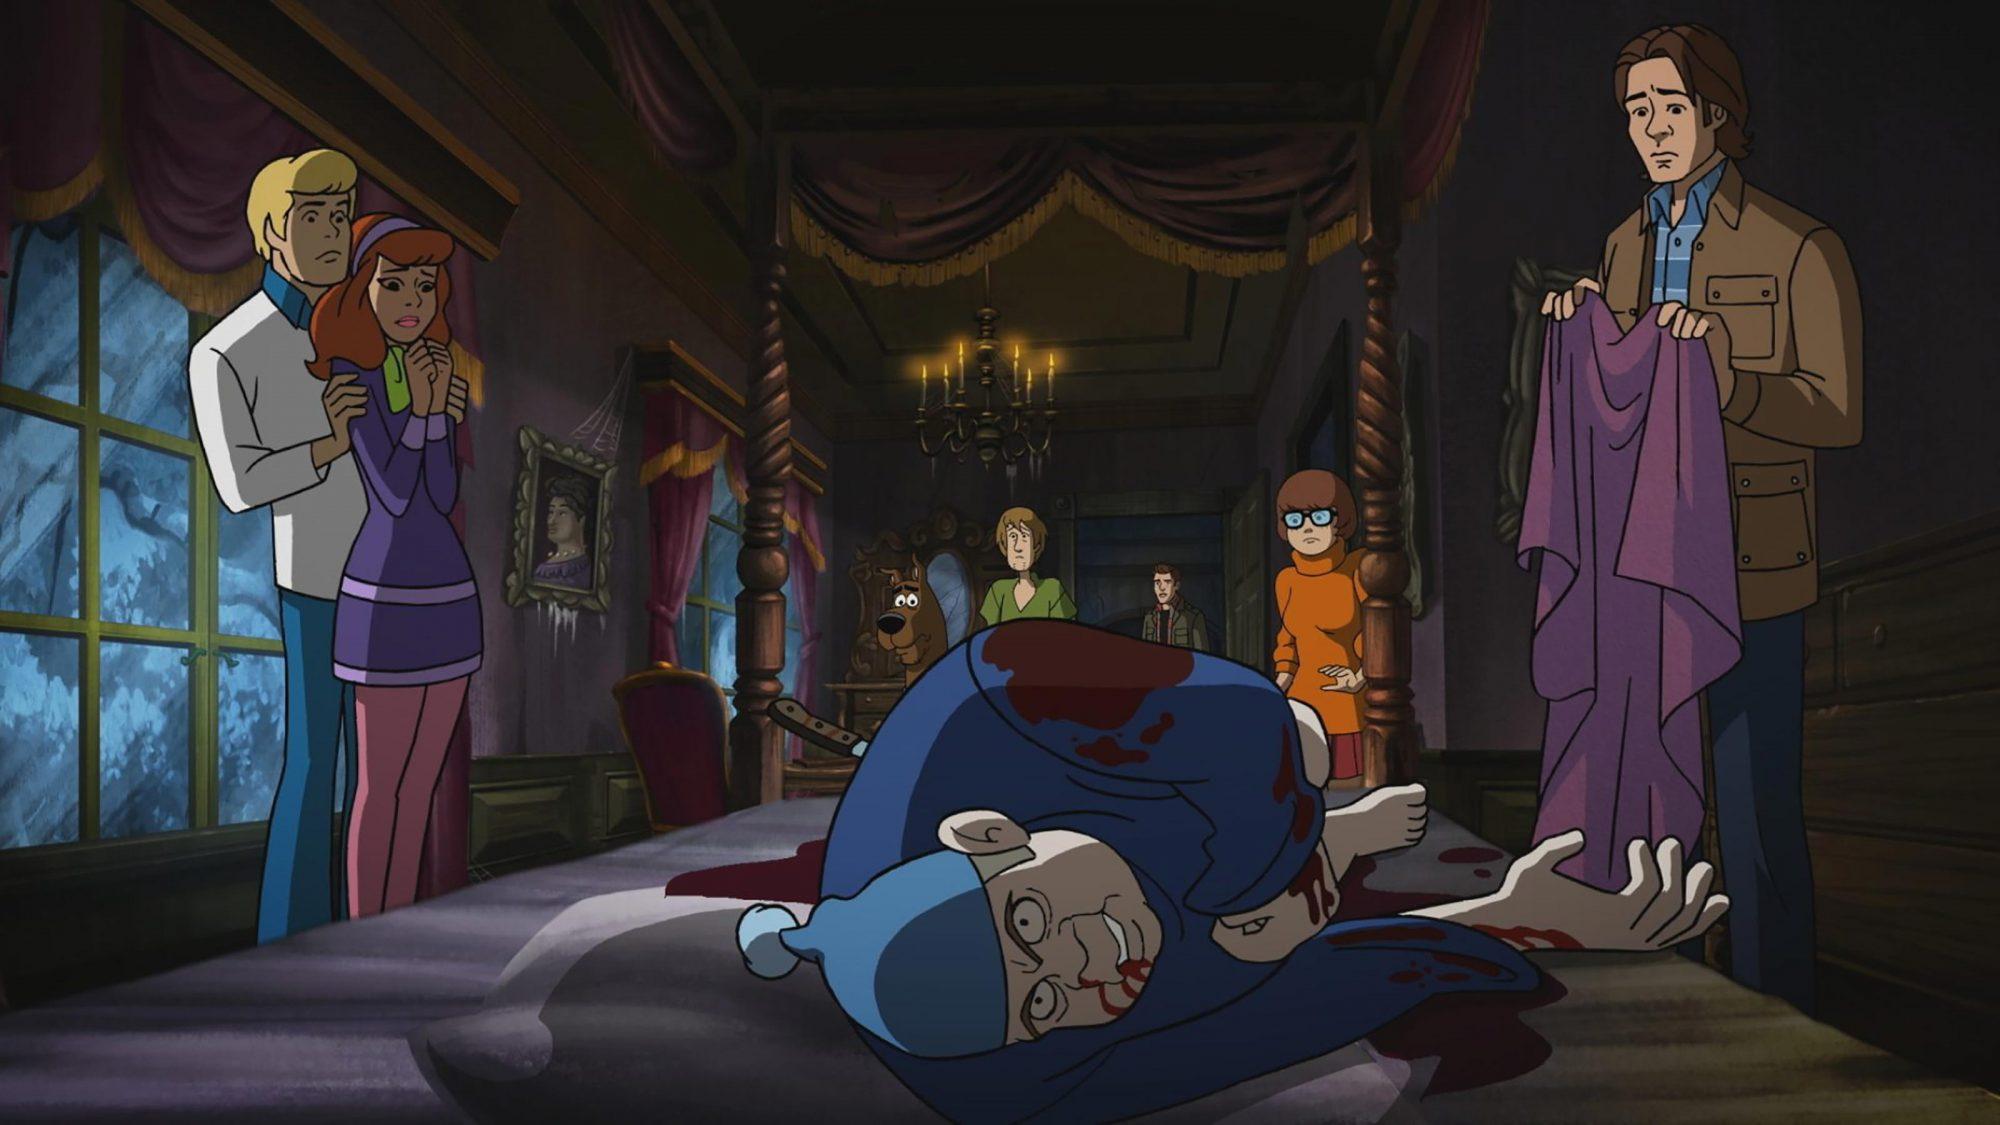 Scoobynatural